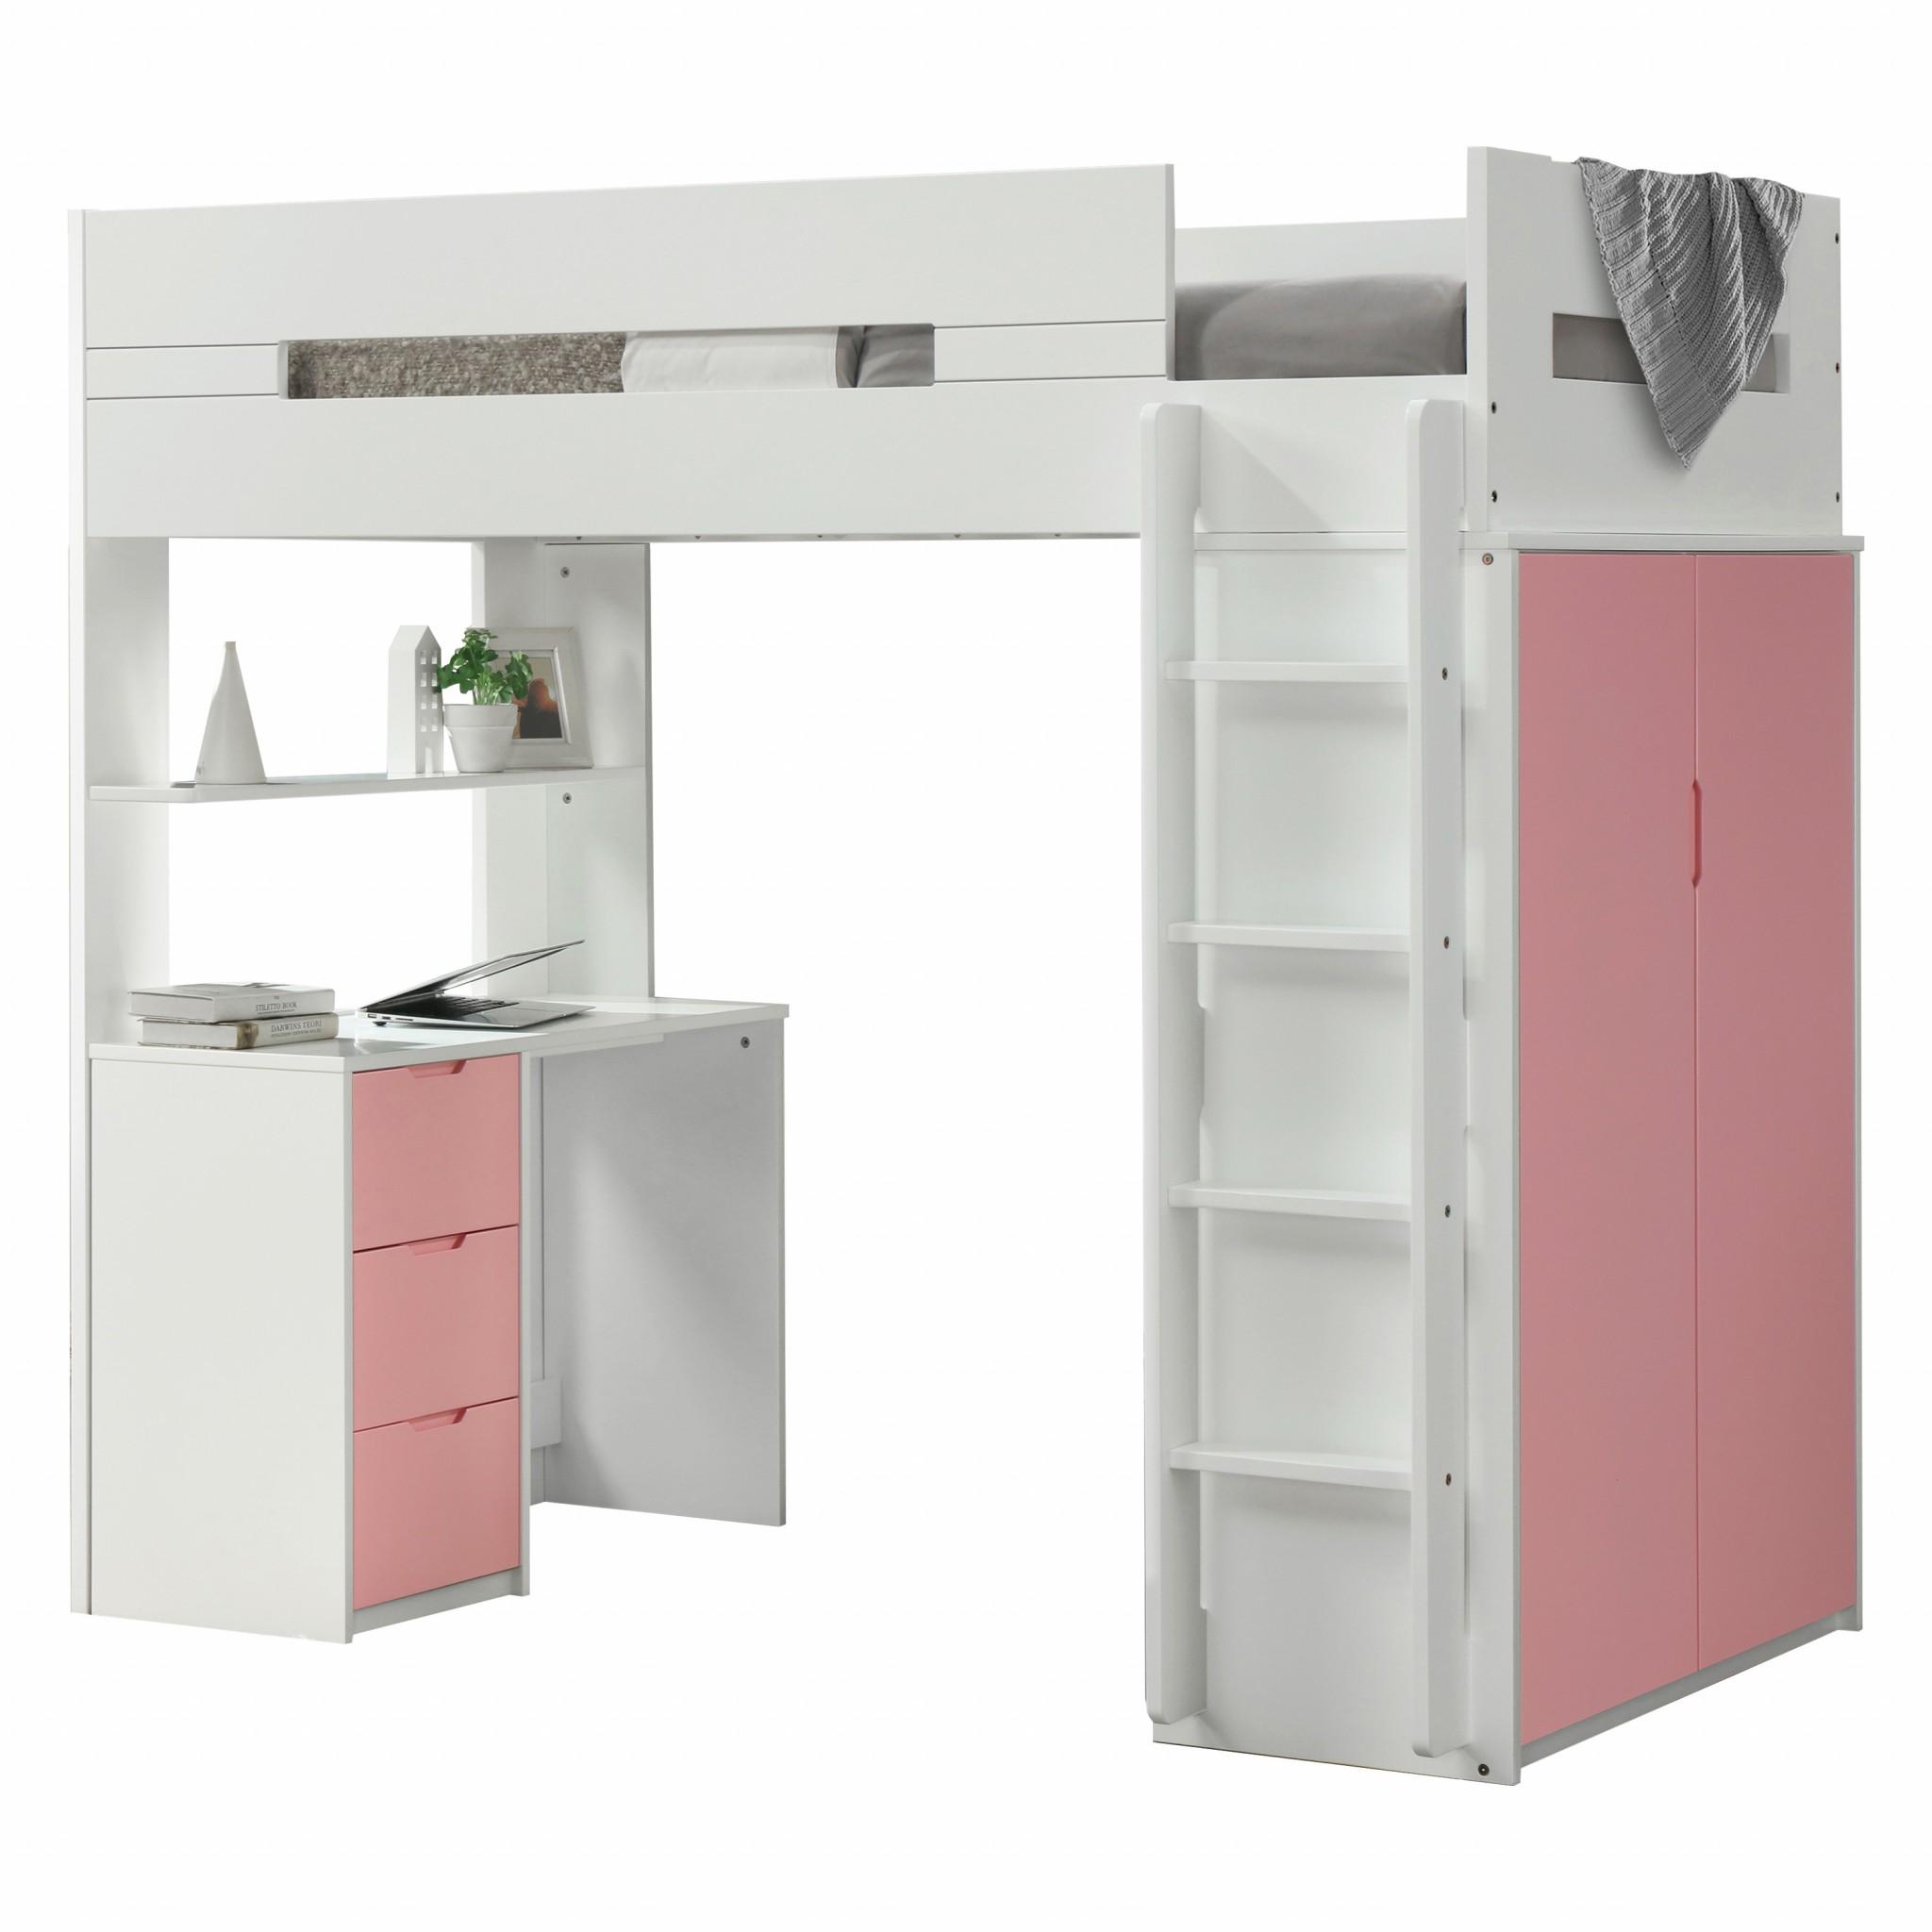 "78"" X 41"" X 70"" White And Pink Laminated Veneer Lumber Loft Bed"